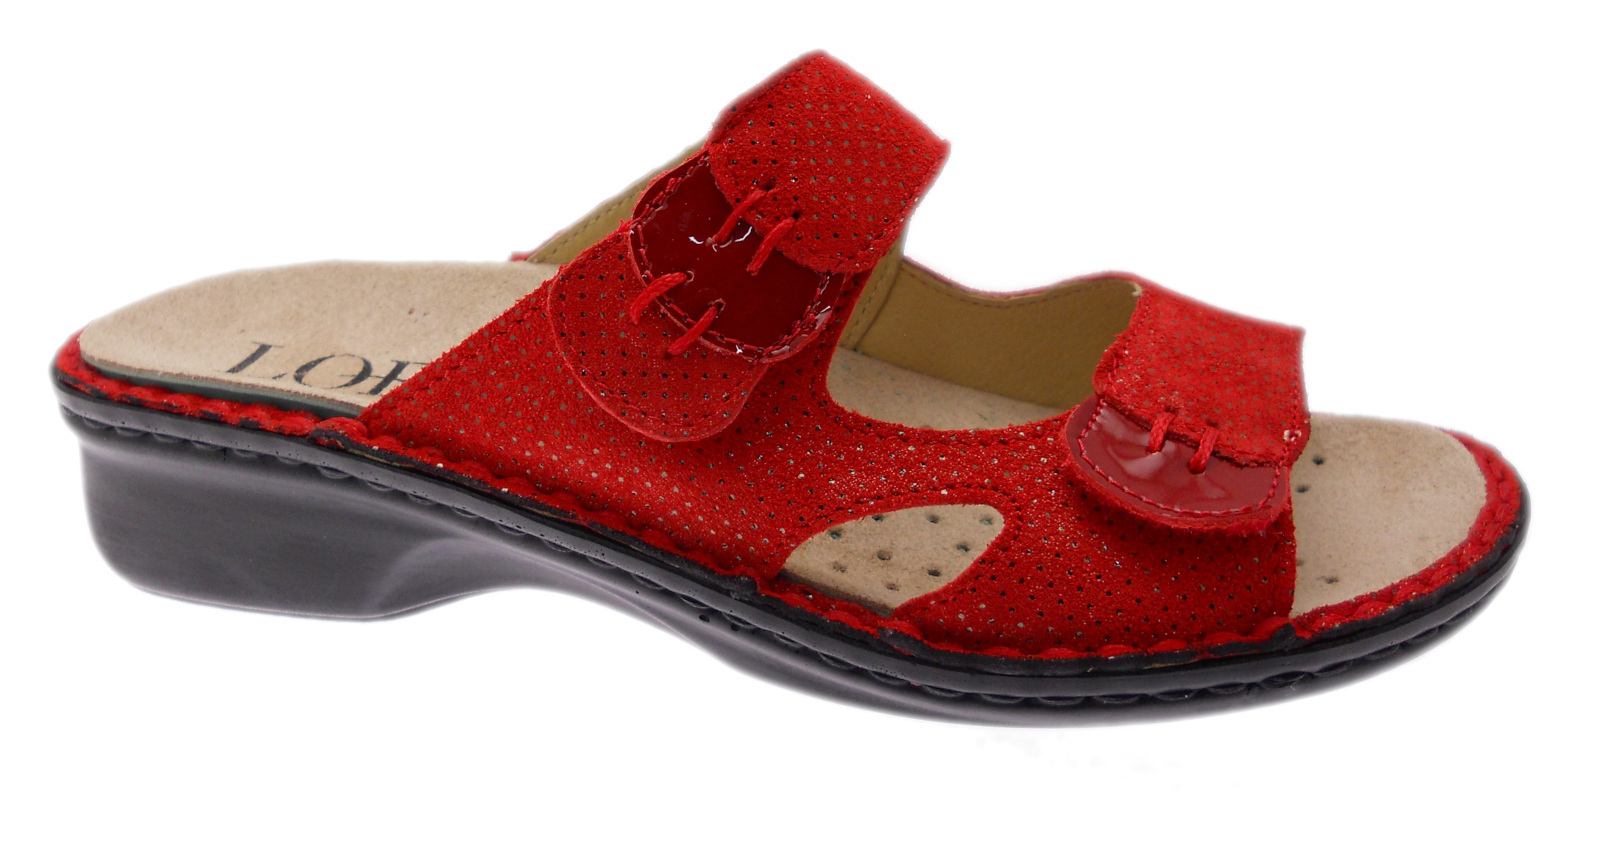 LOREN M2772 orthopedic slipper with adjustable red footbed Loren